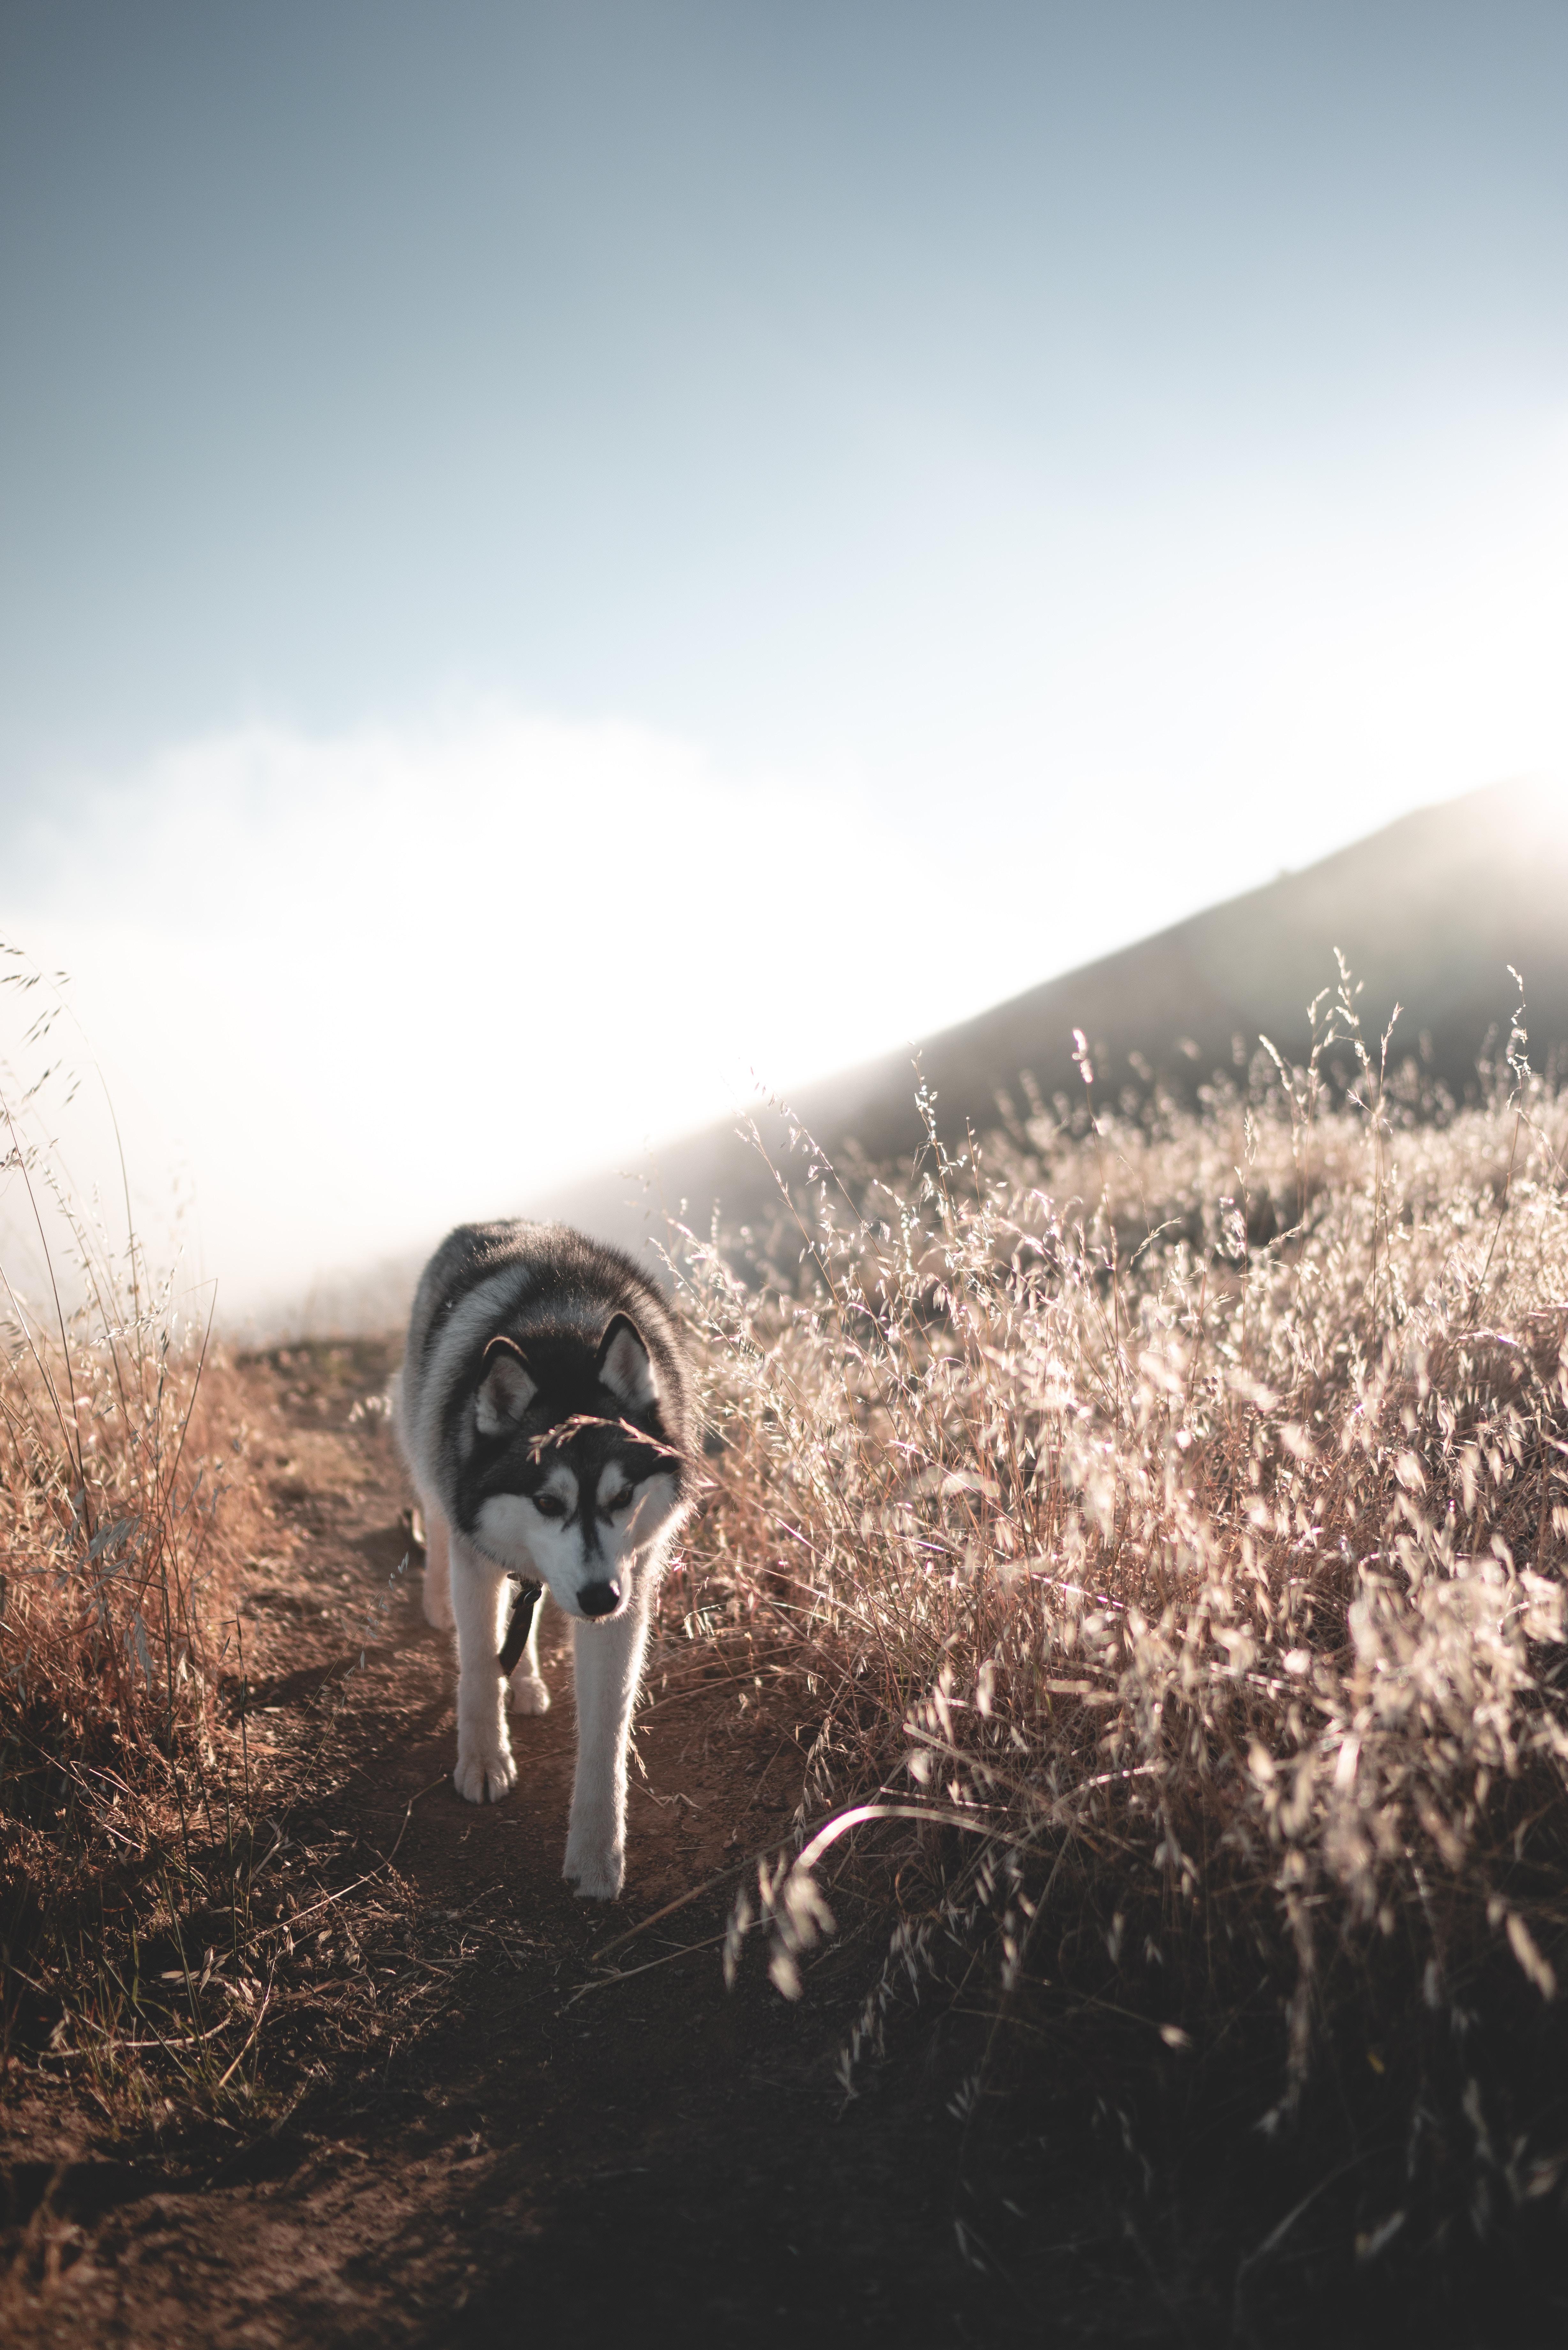 Husky spokojnie przechadza się pośród pól, na polnej ścieżce.